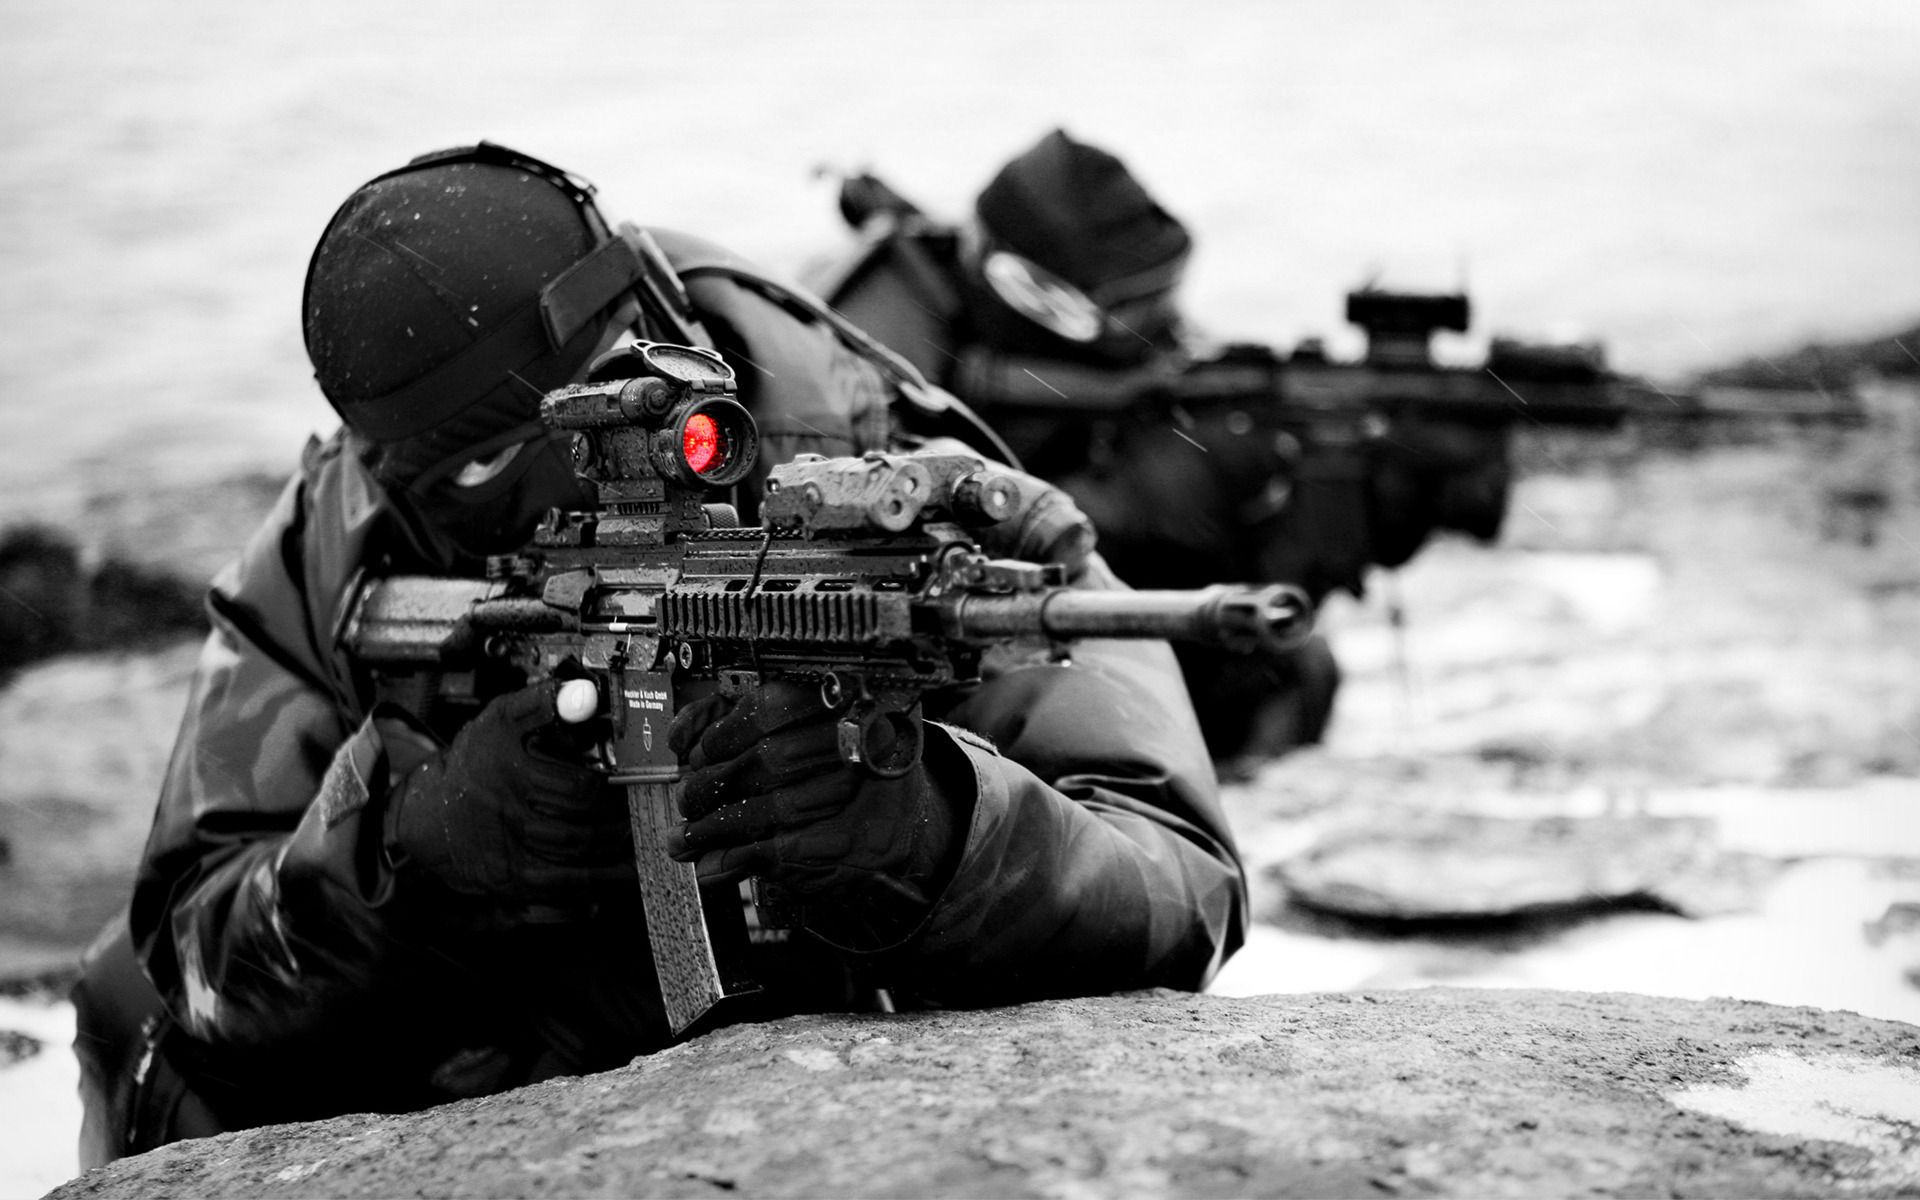 Sniper Ghost Warrior Wallpapers in Ultra HD K